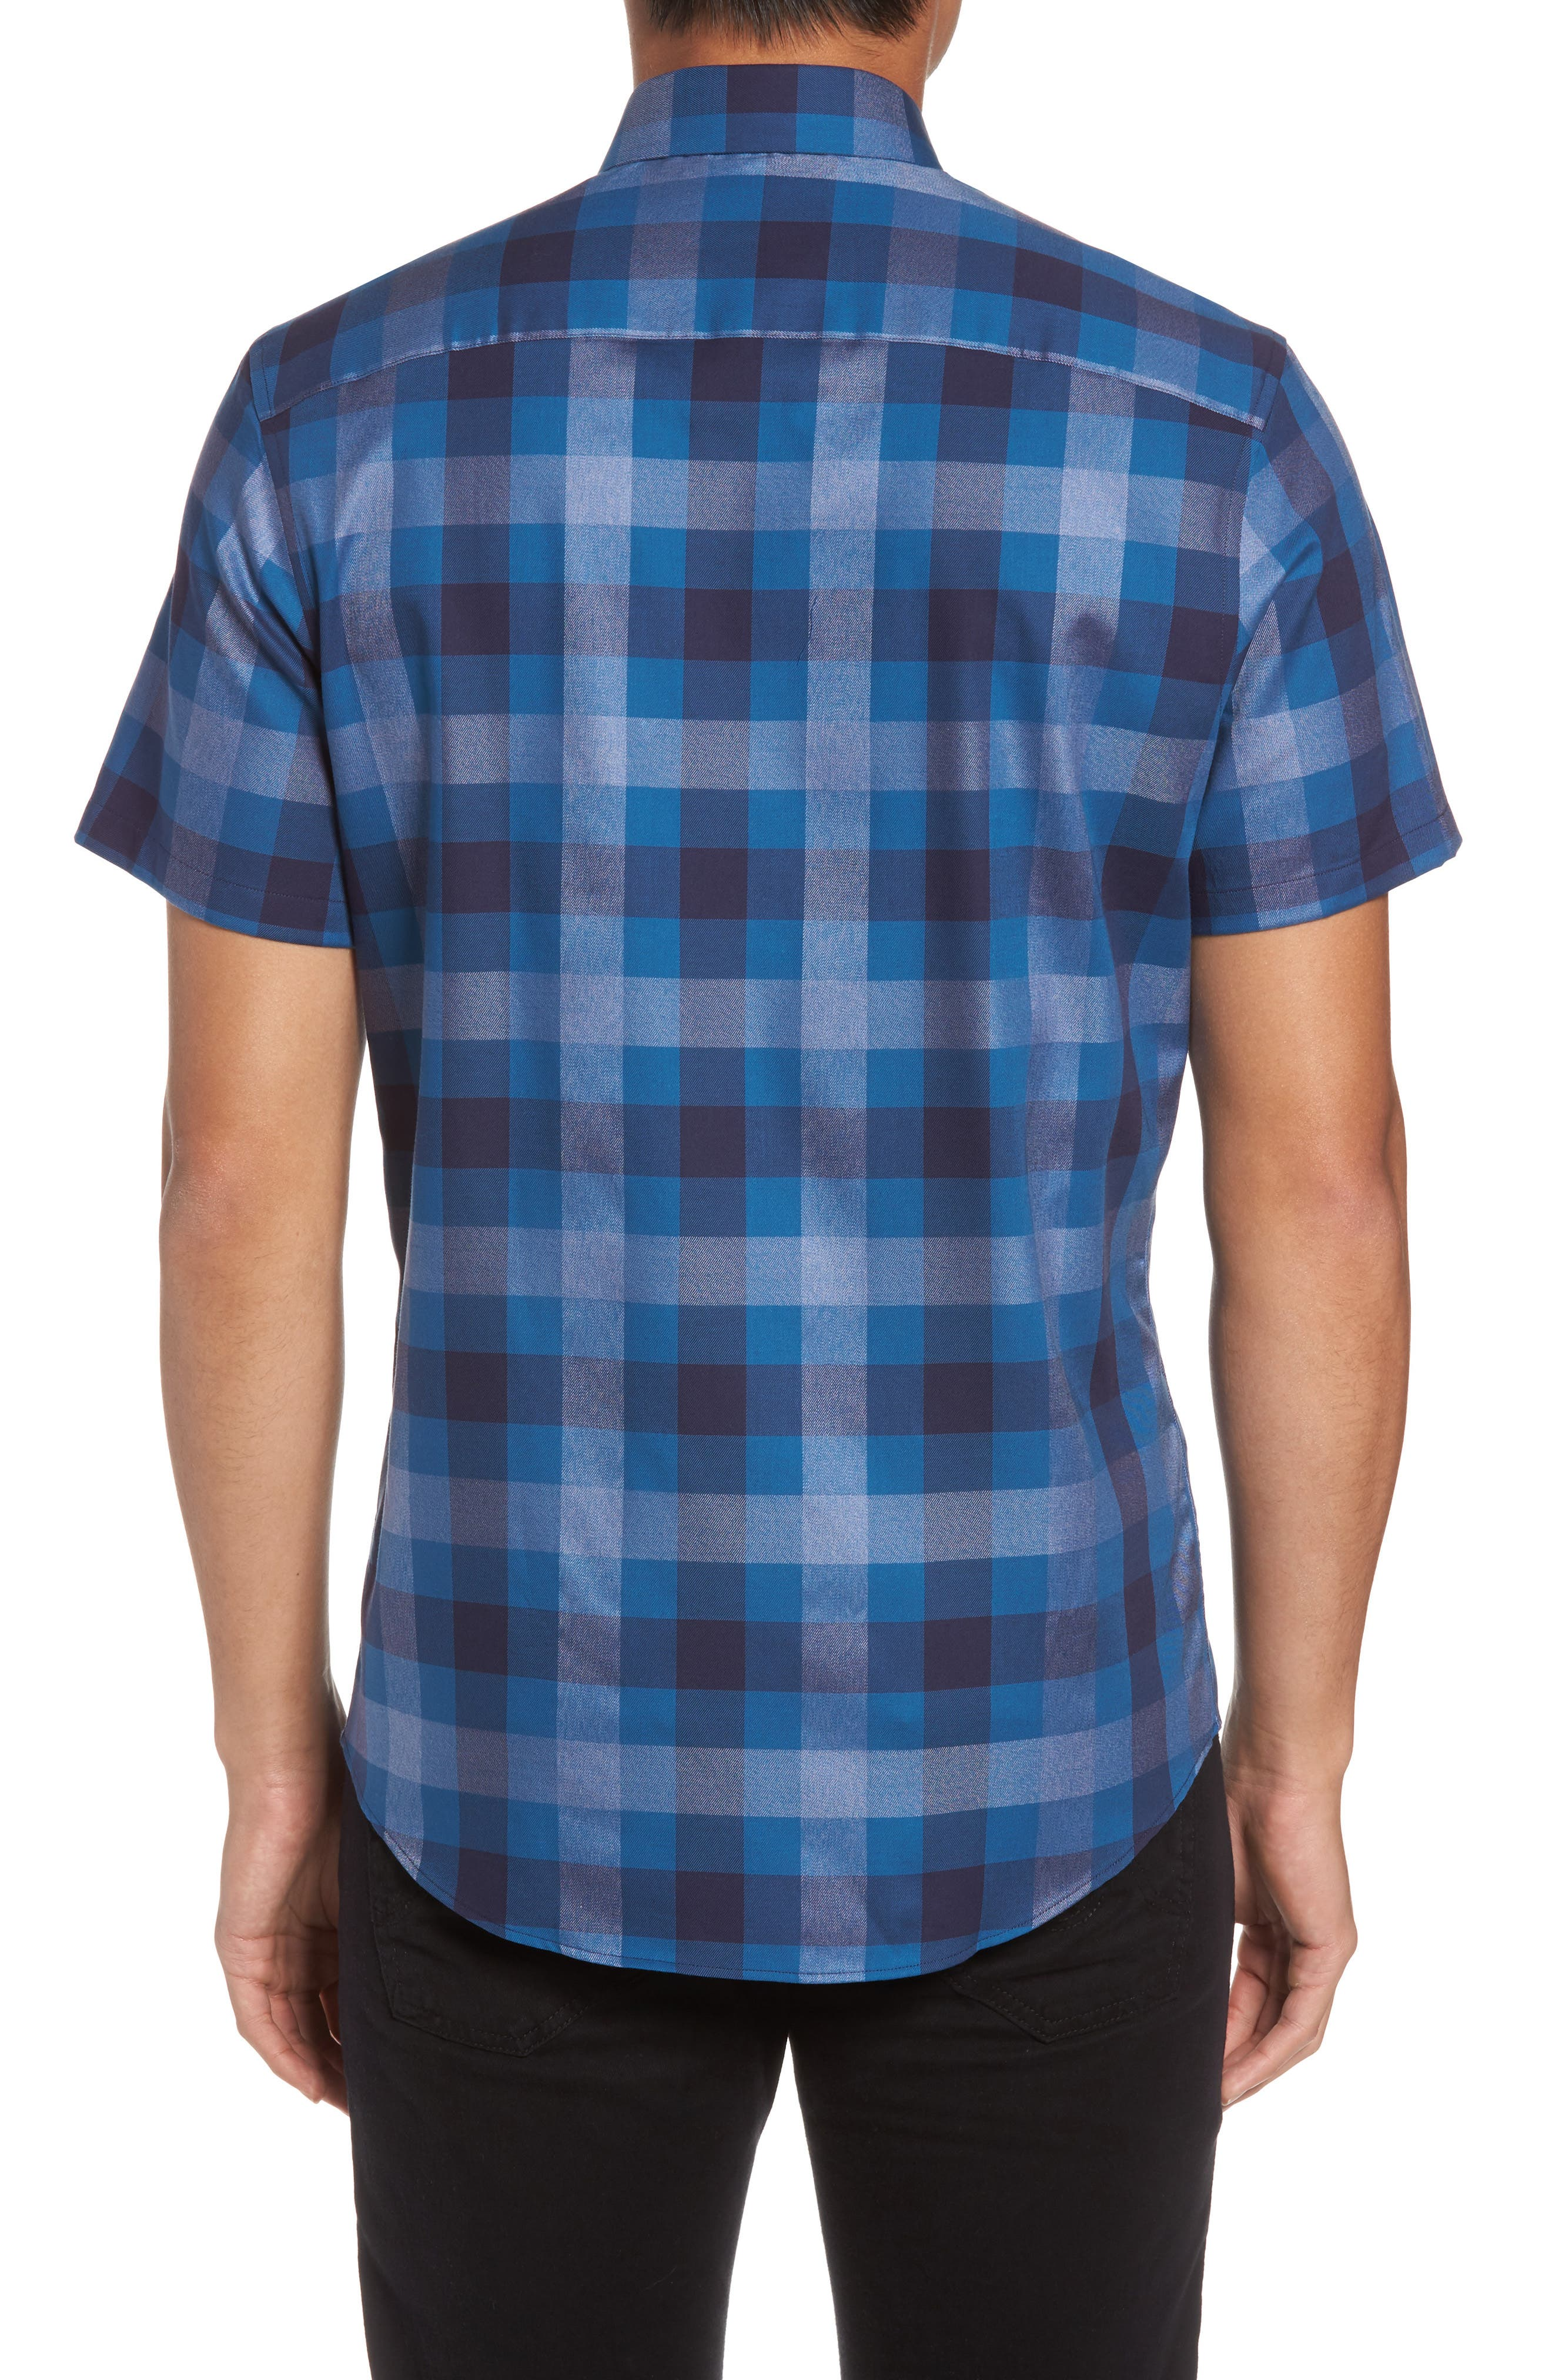 No-Iron Large Check Woven Shirt,                             Alternate thumbnail 2, color,                             Navy Dusk Heather Check